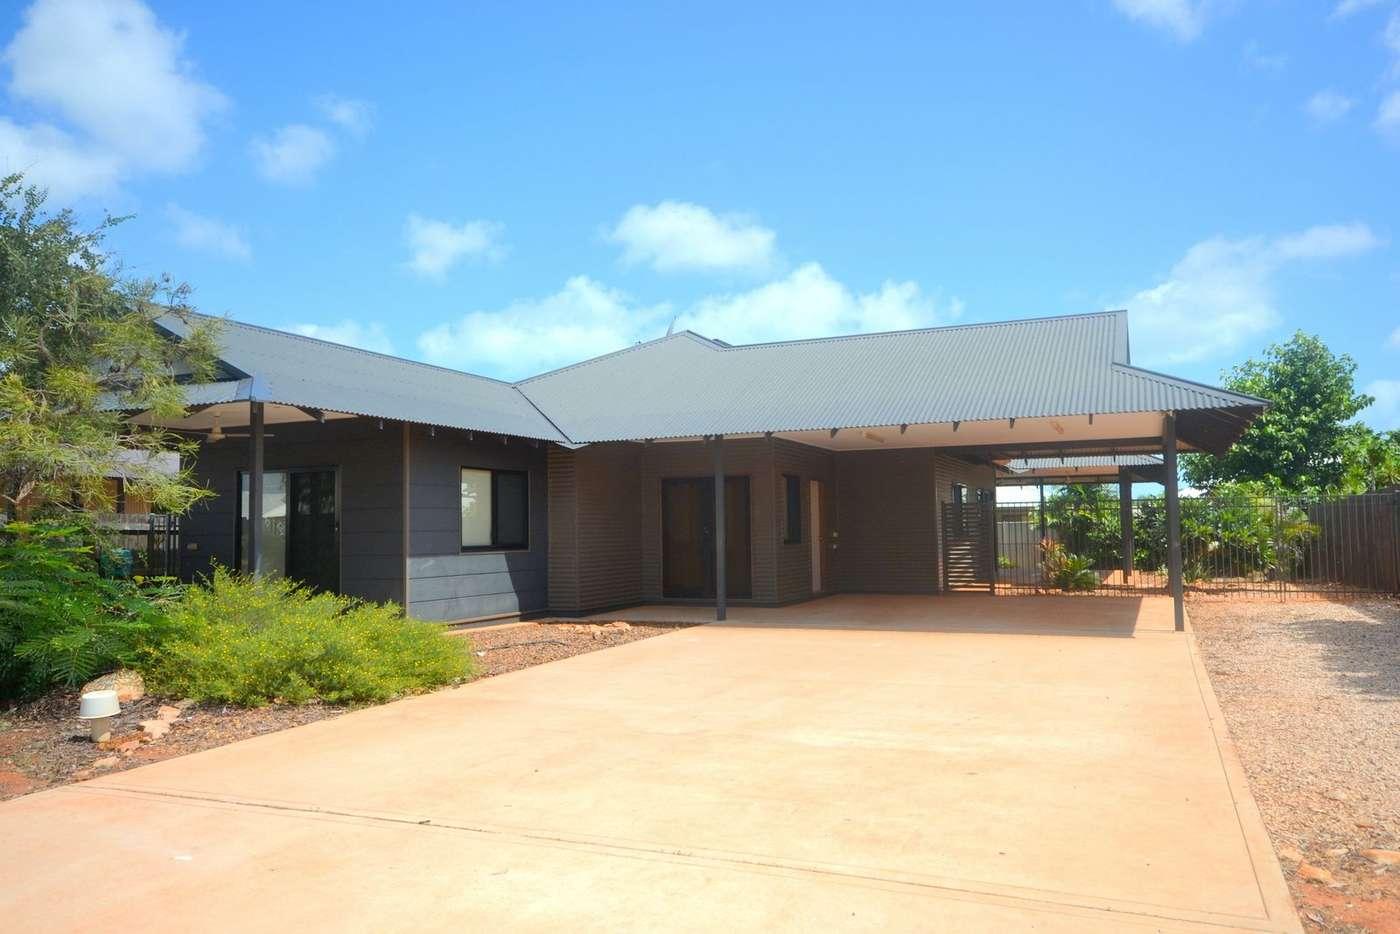 Main view of Homely house listing, 40 Tanami Drive, Bilingurr, WA 6725